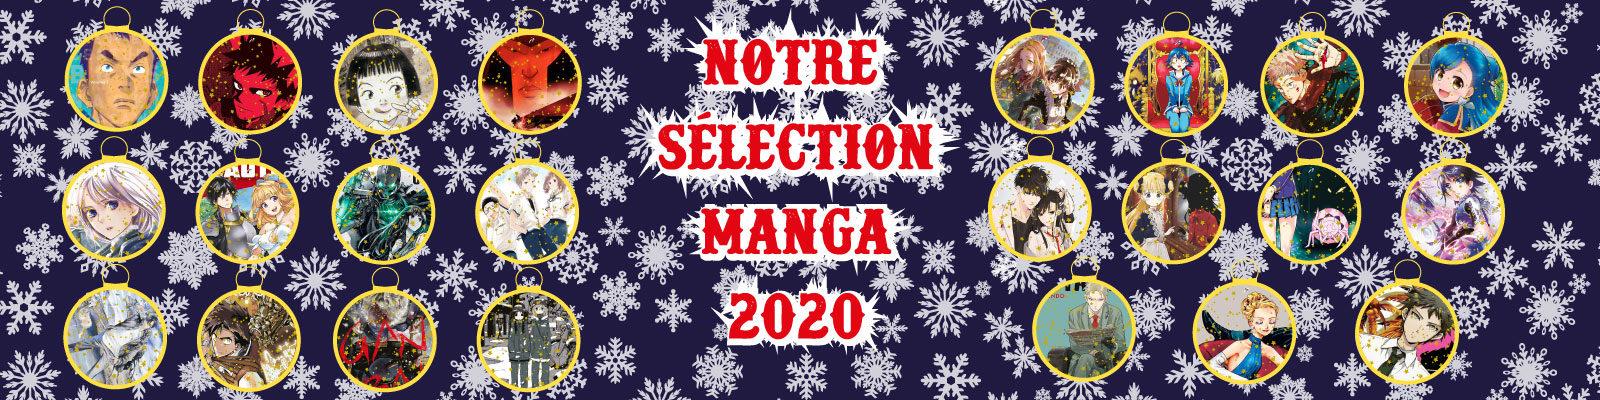 Sélection manga 2020